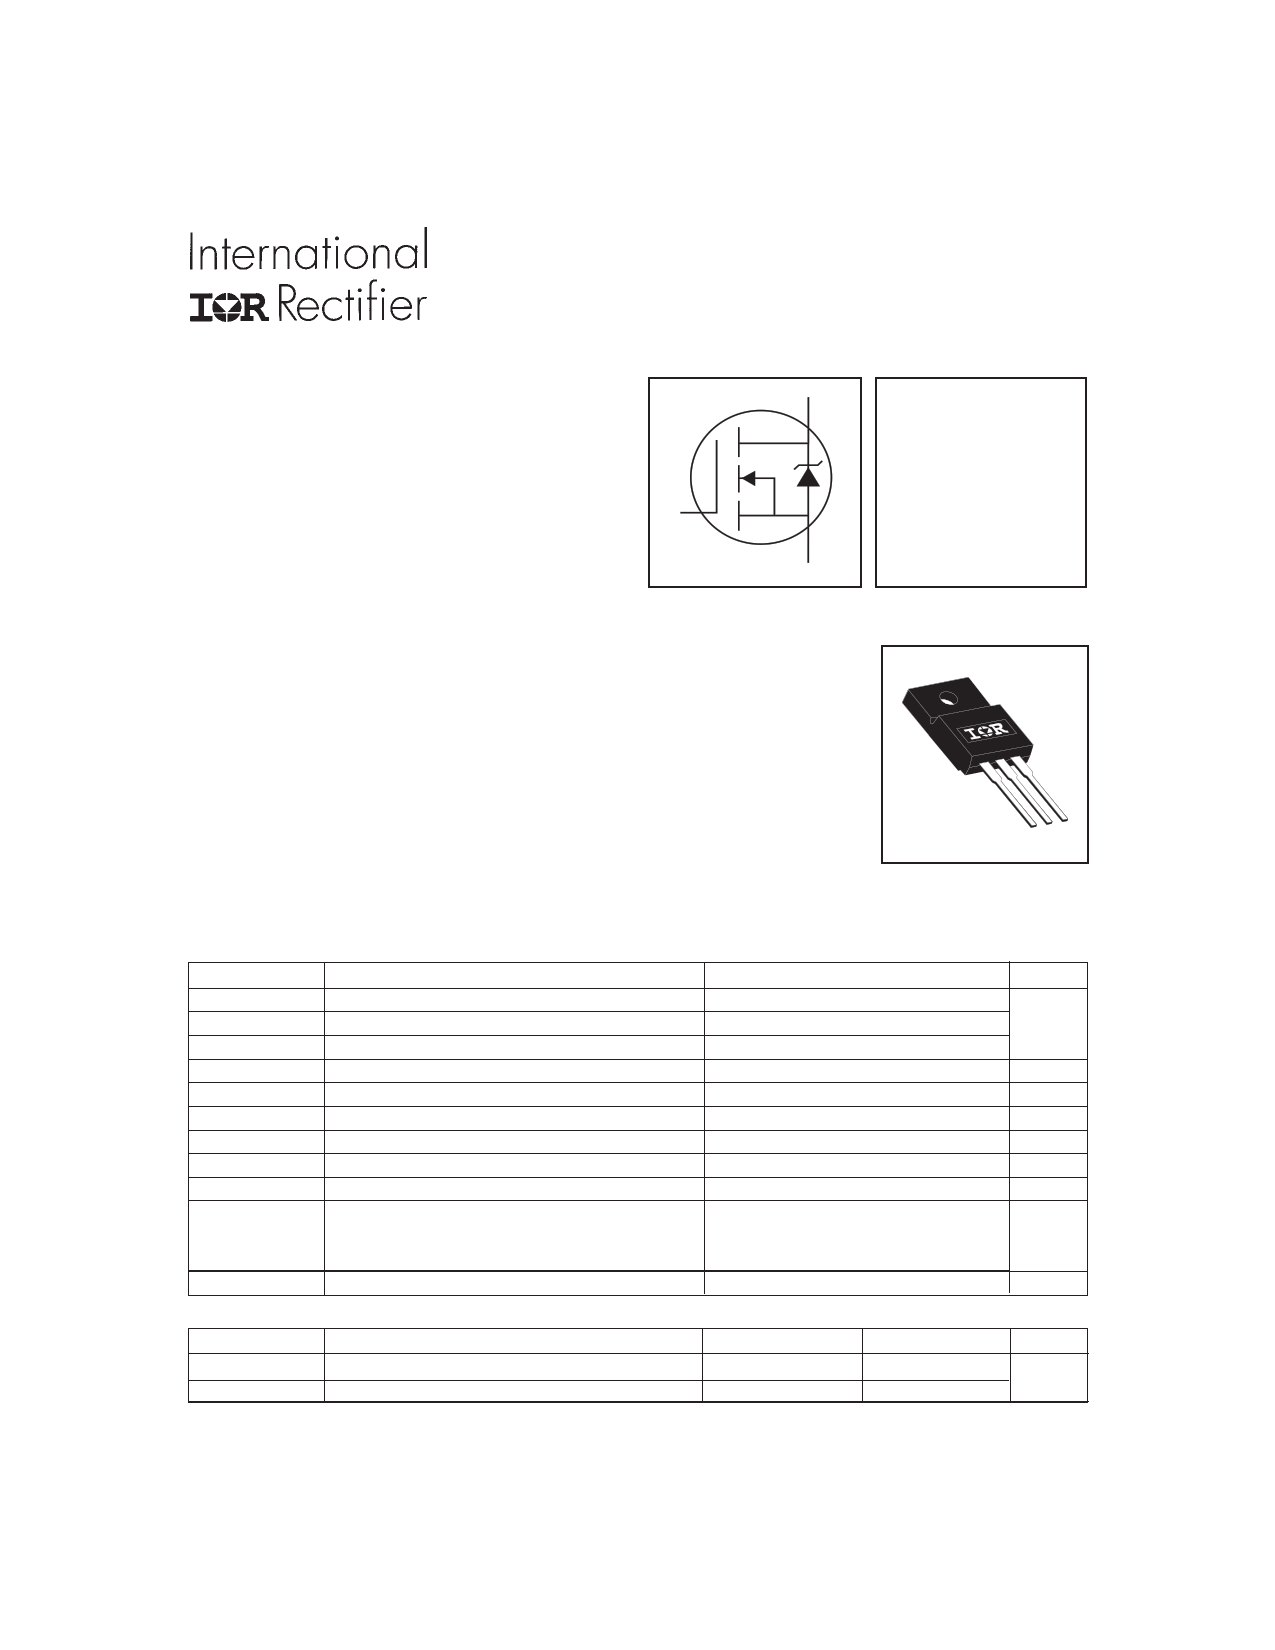 IRFIZ48VPbF Datasheet, IRFIZ48VPbF PDF,ピン配置, 機能